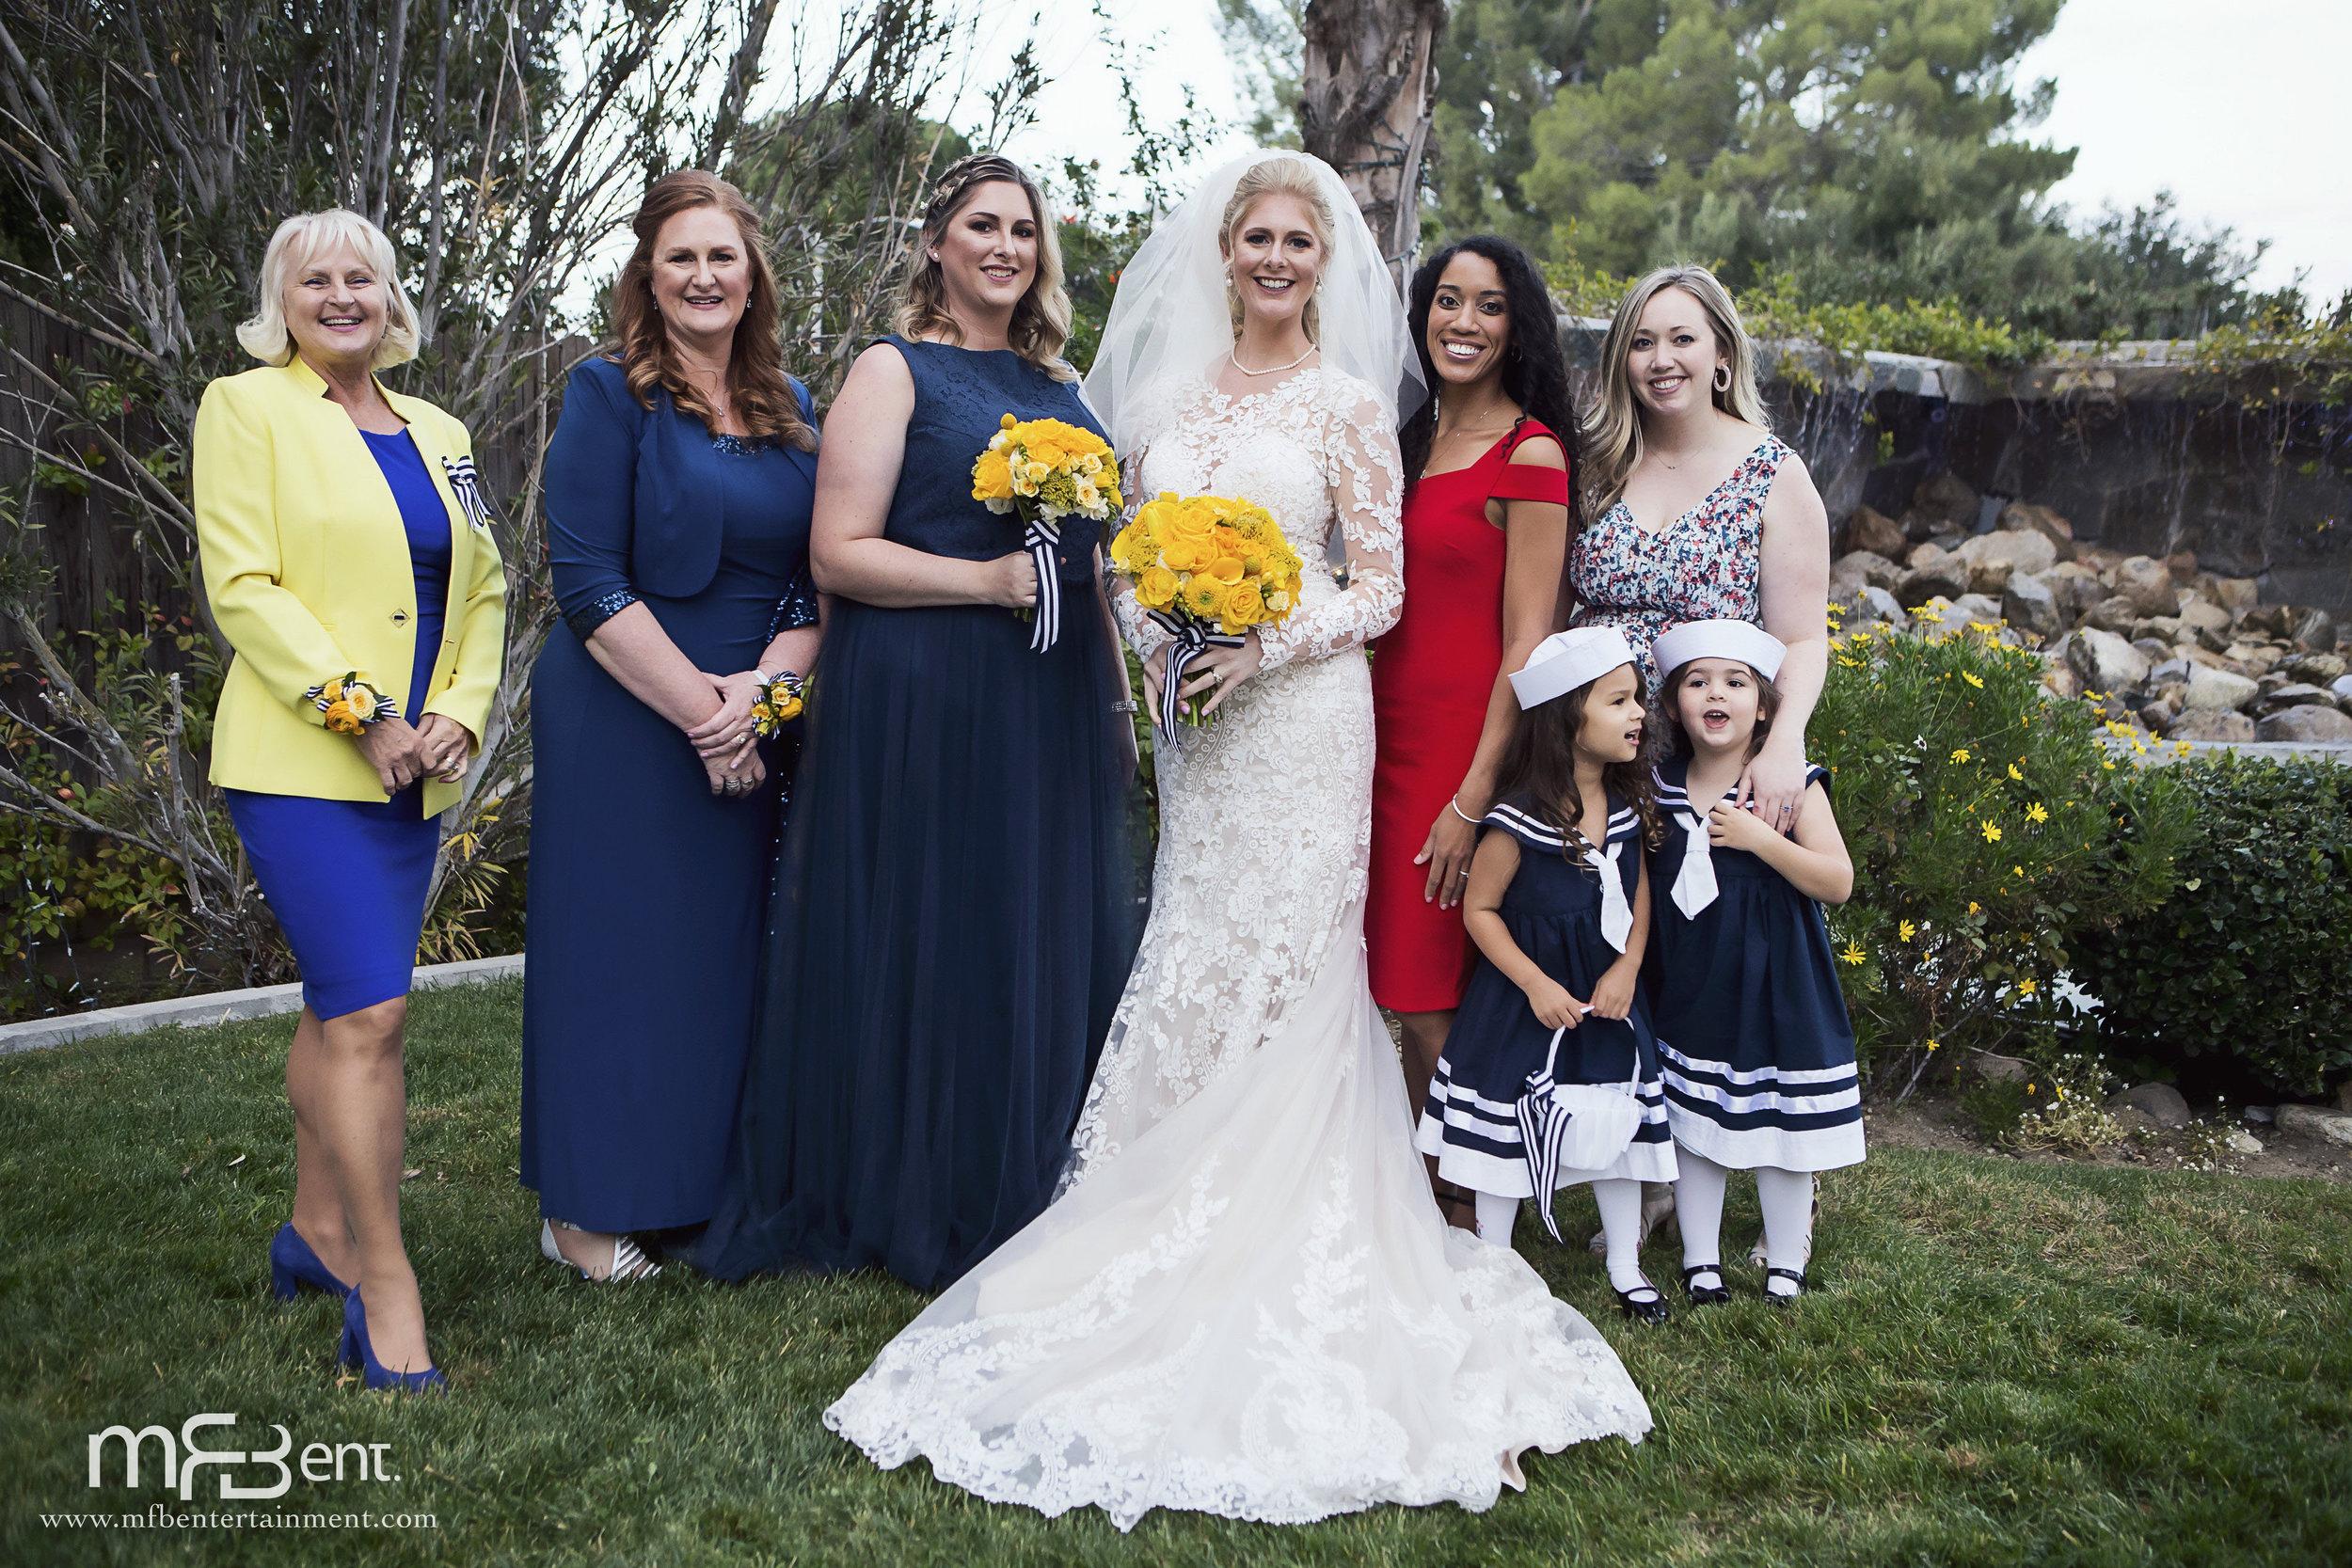 PIOTR CHELSEA WEDDING-PHOTO SESSION-0009 L.jpg